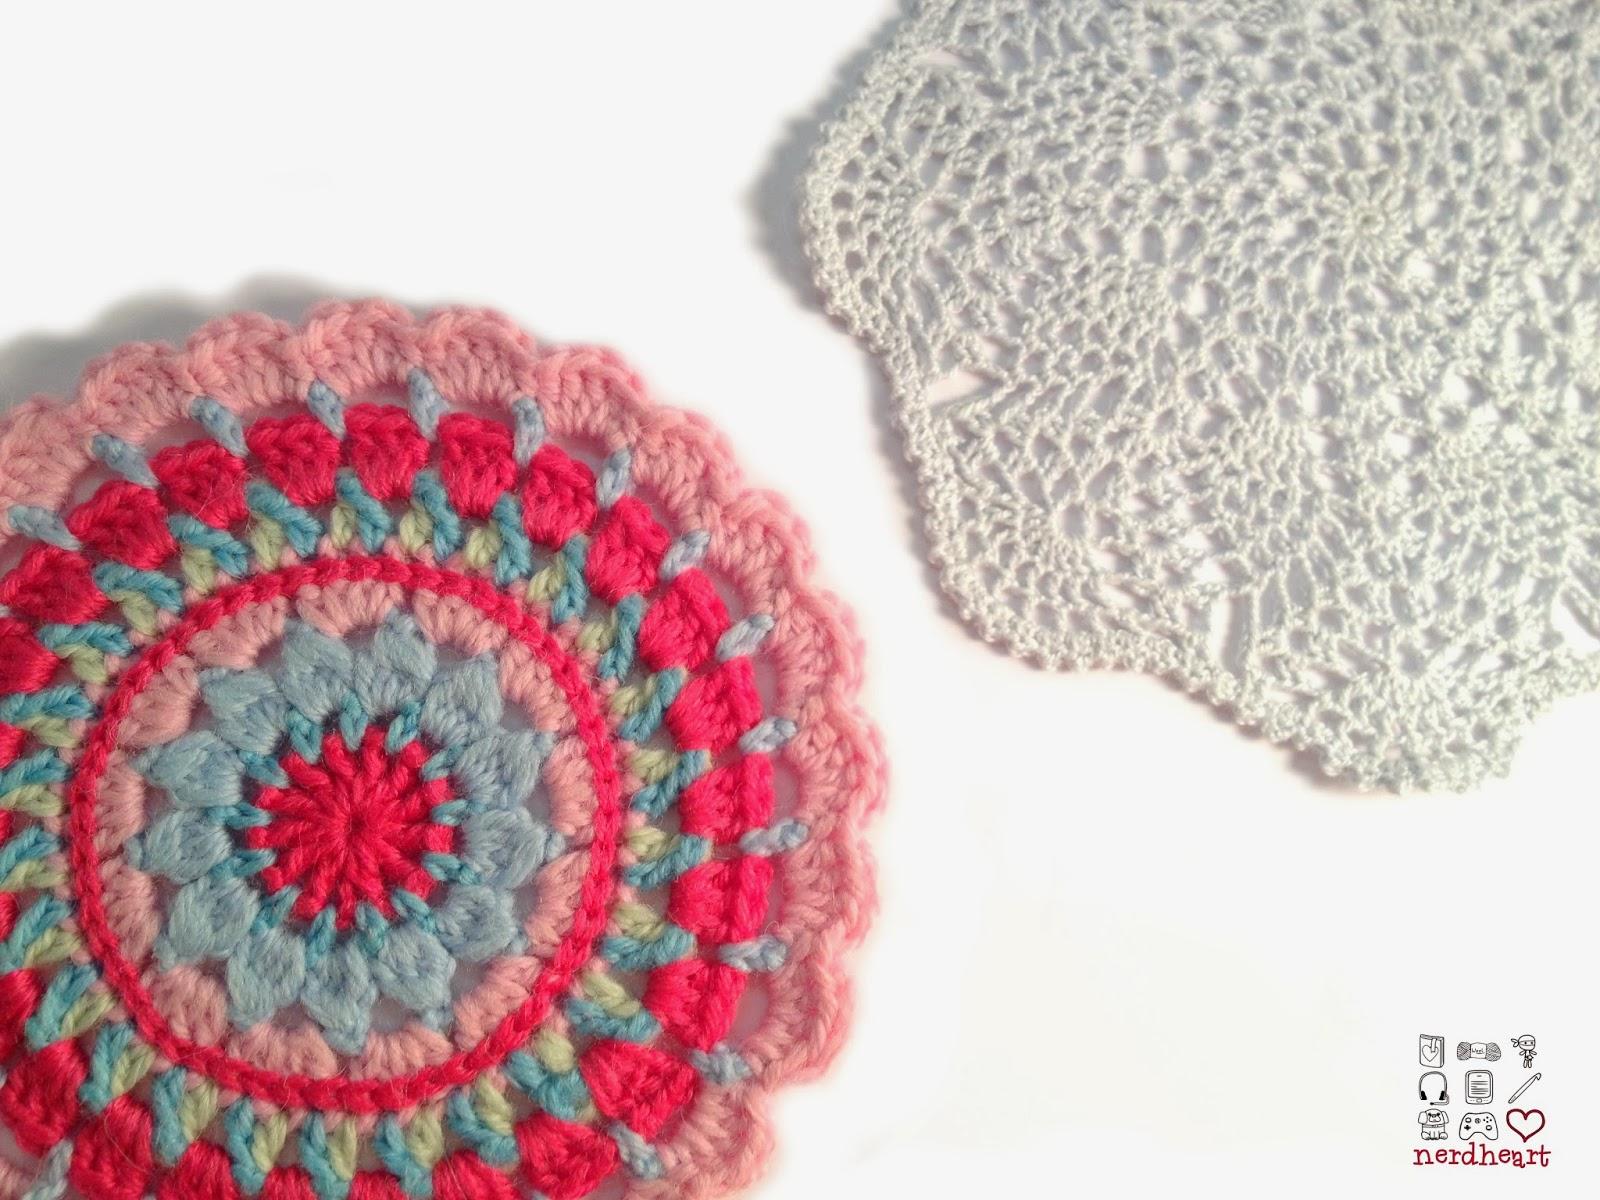 Nerdheart: Crochet Doily and Mandala